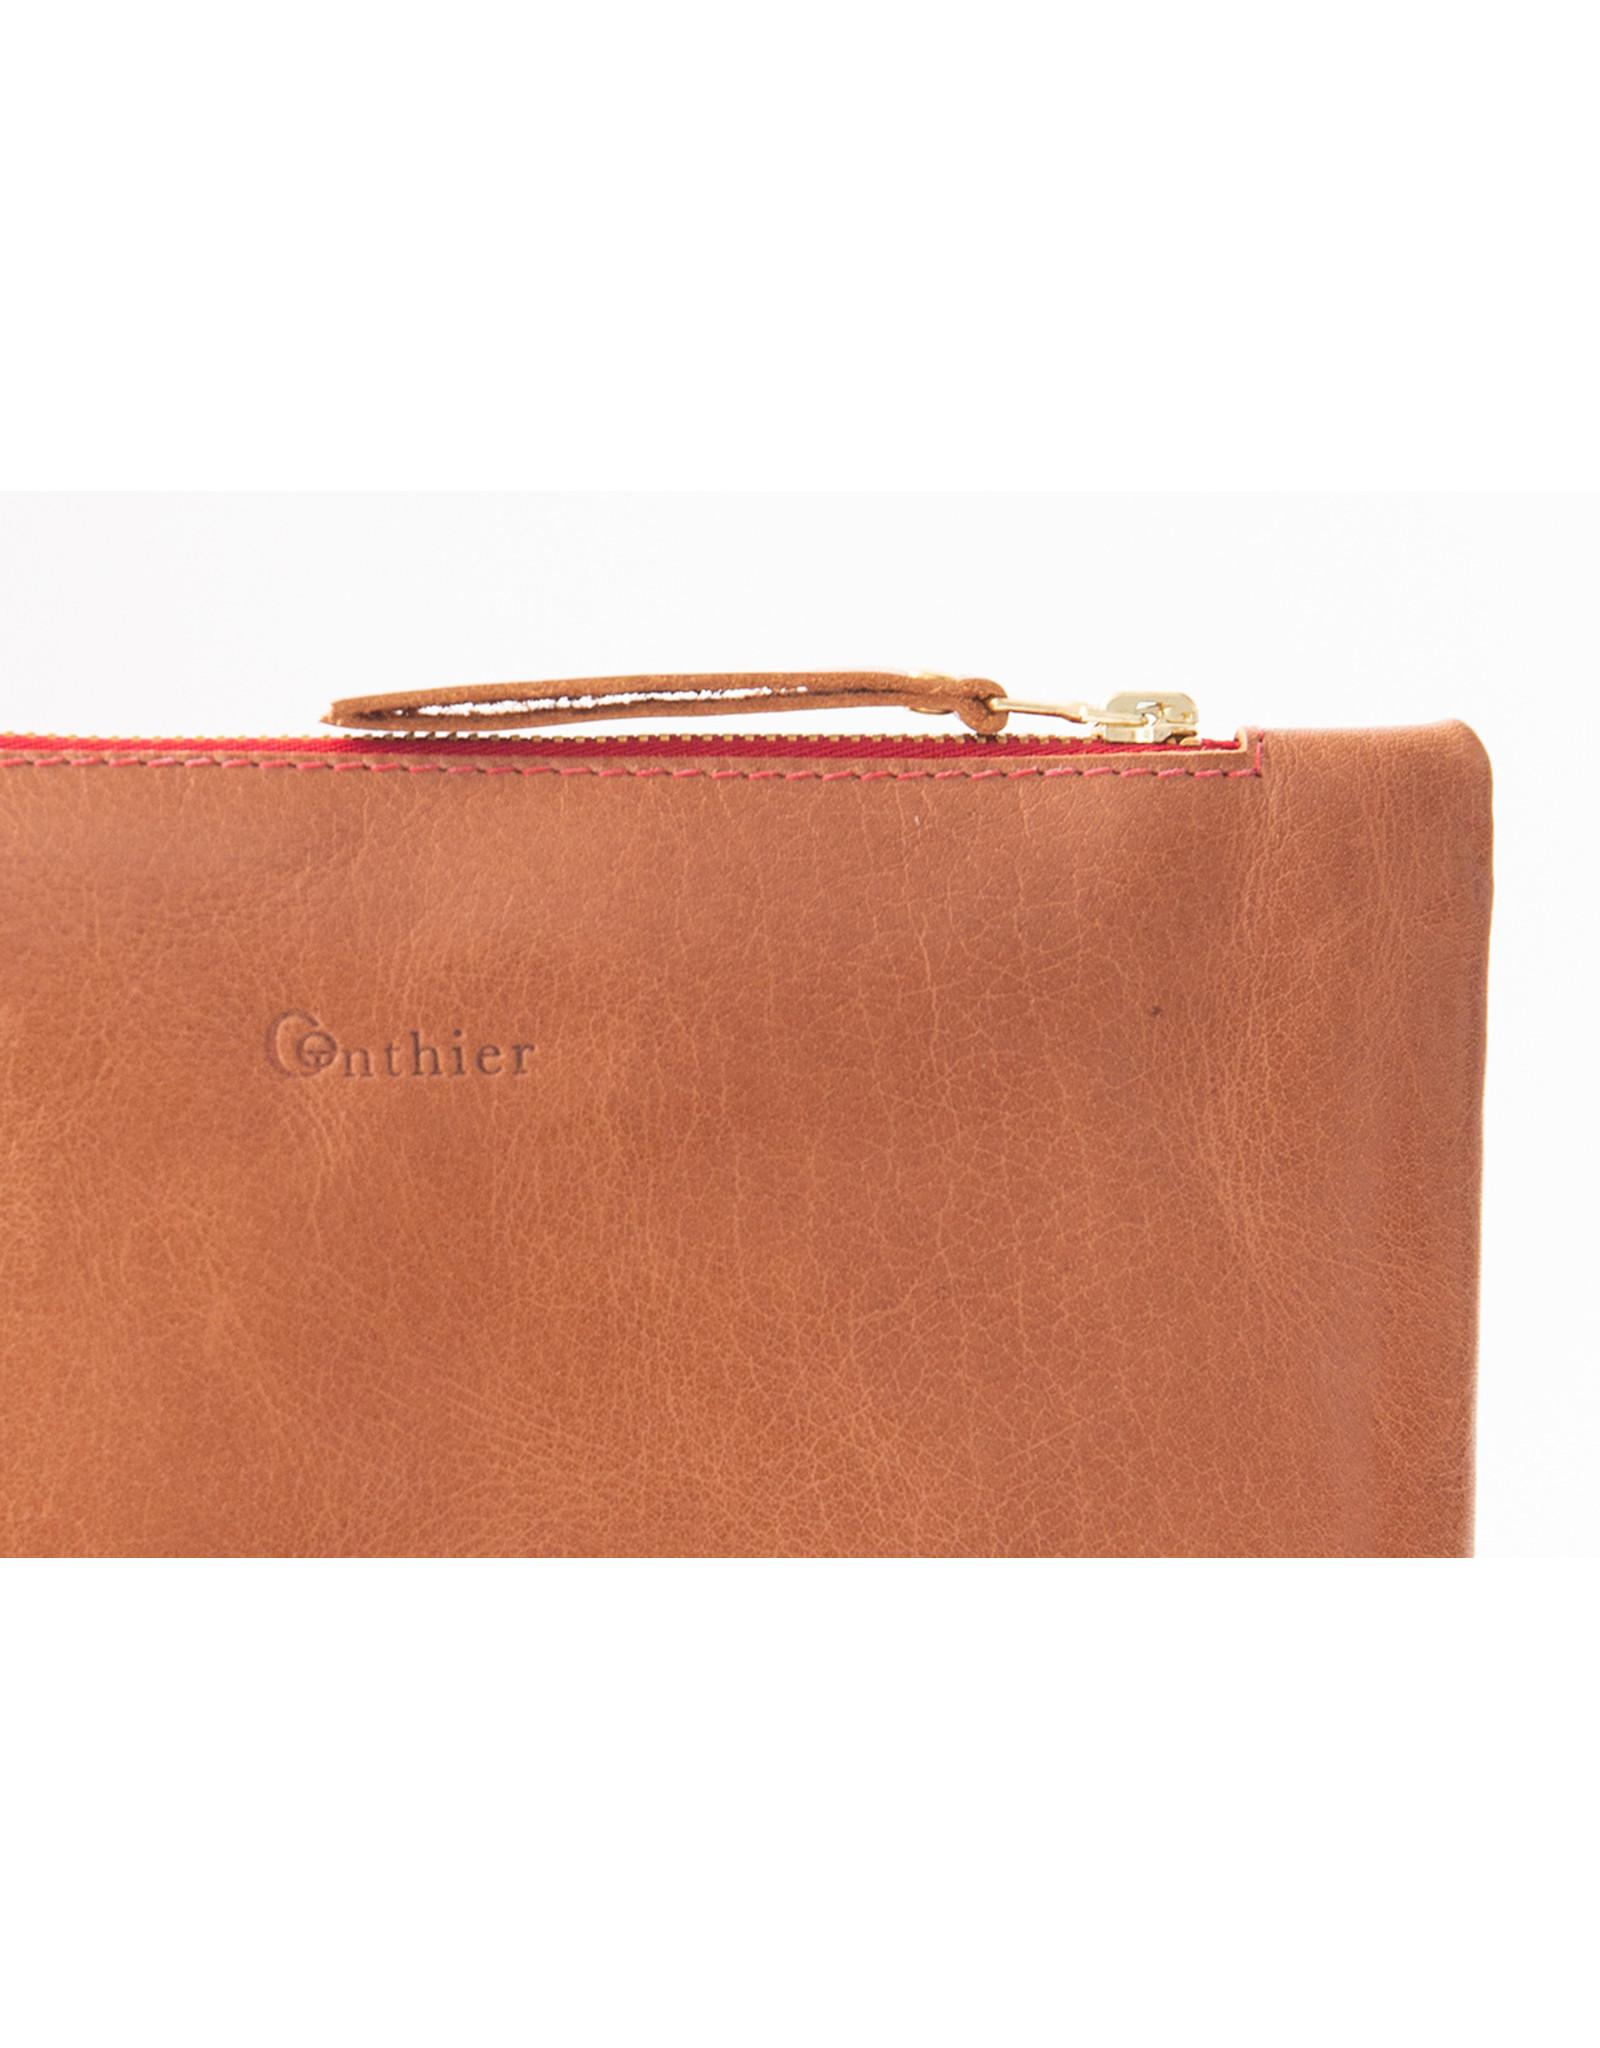 Gonthier Callas Caramel